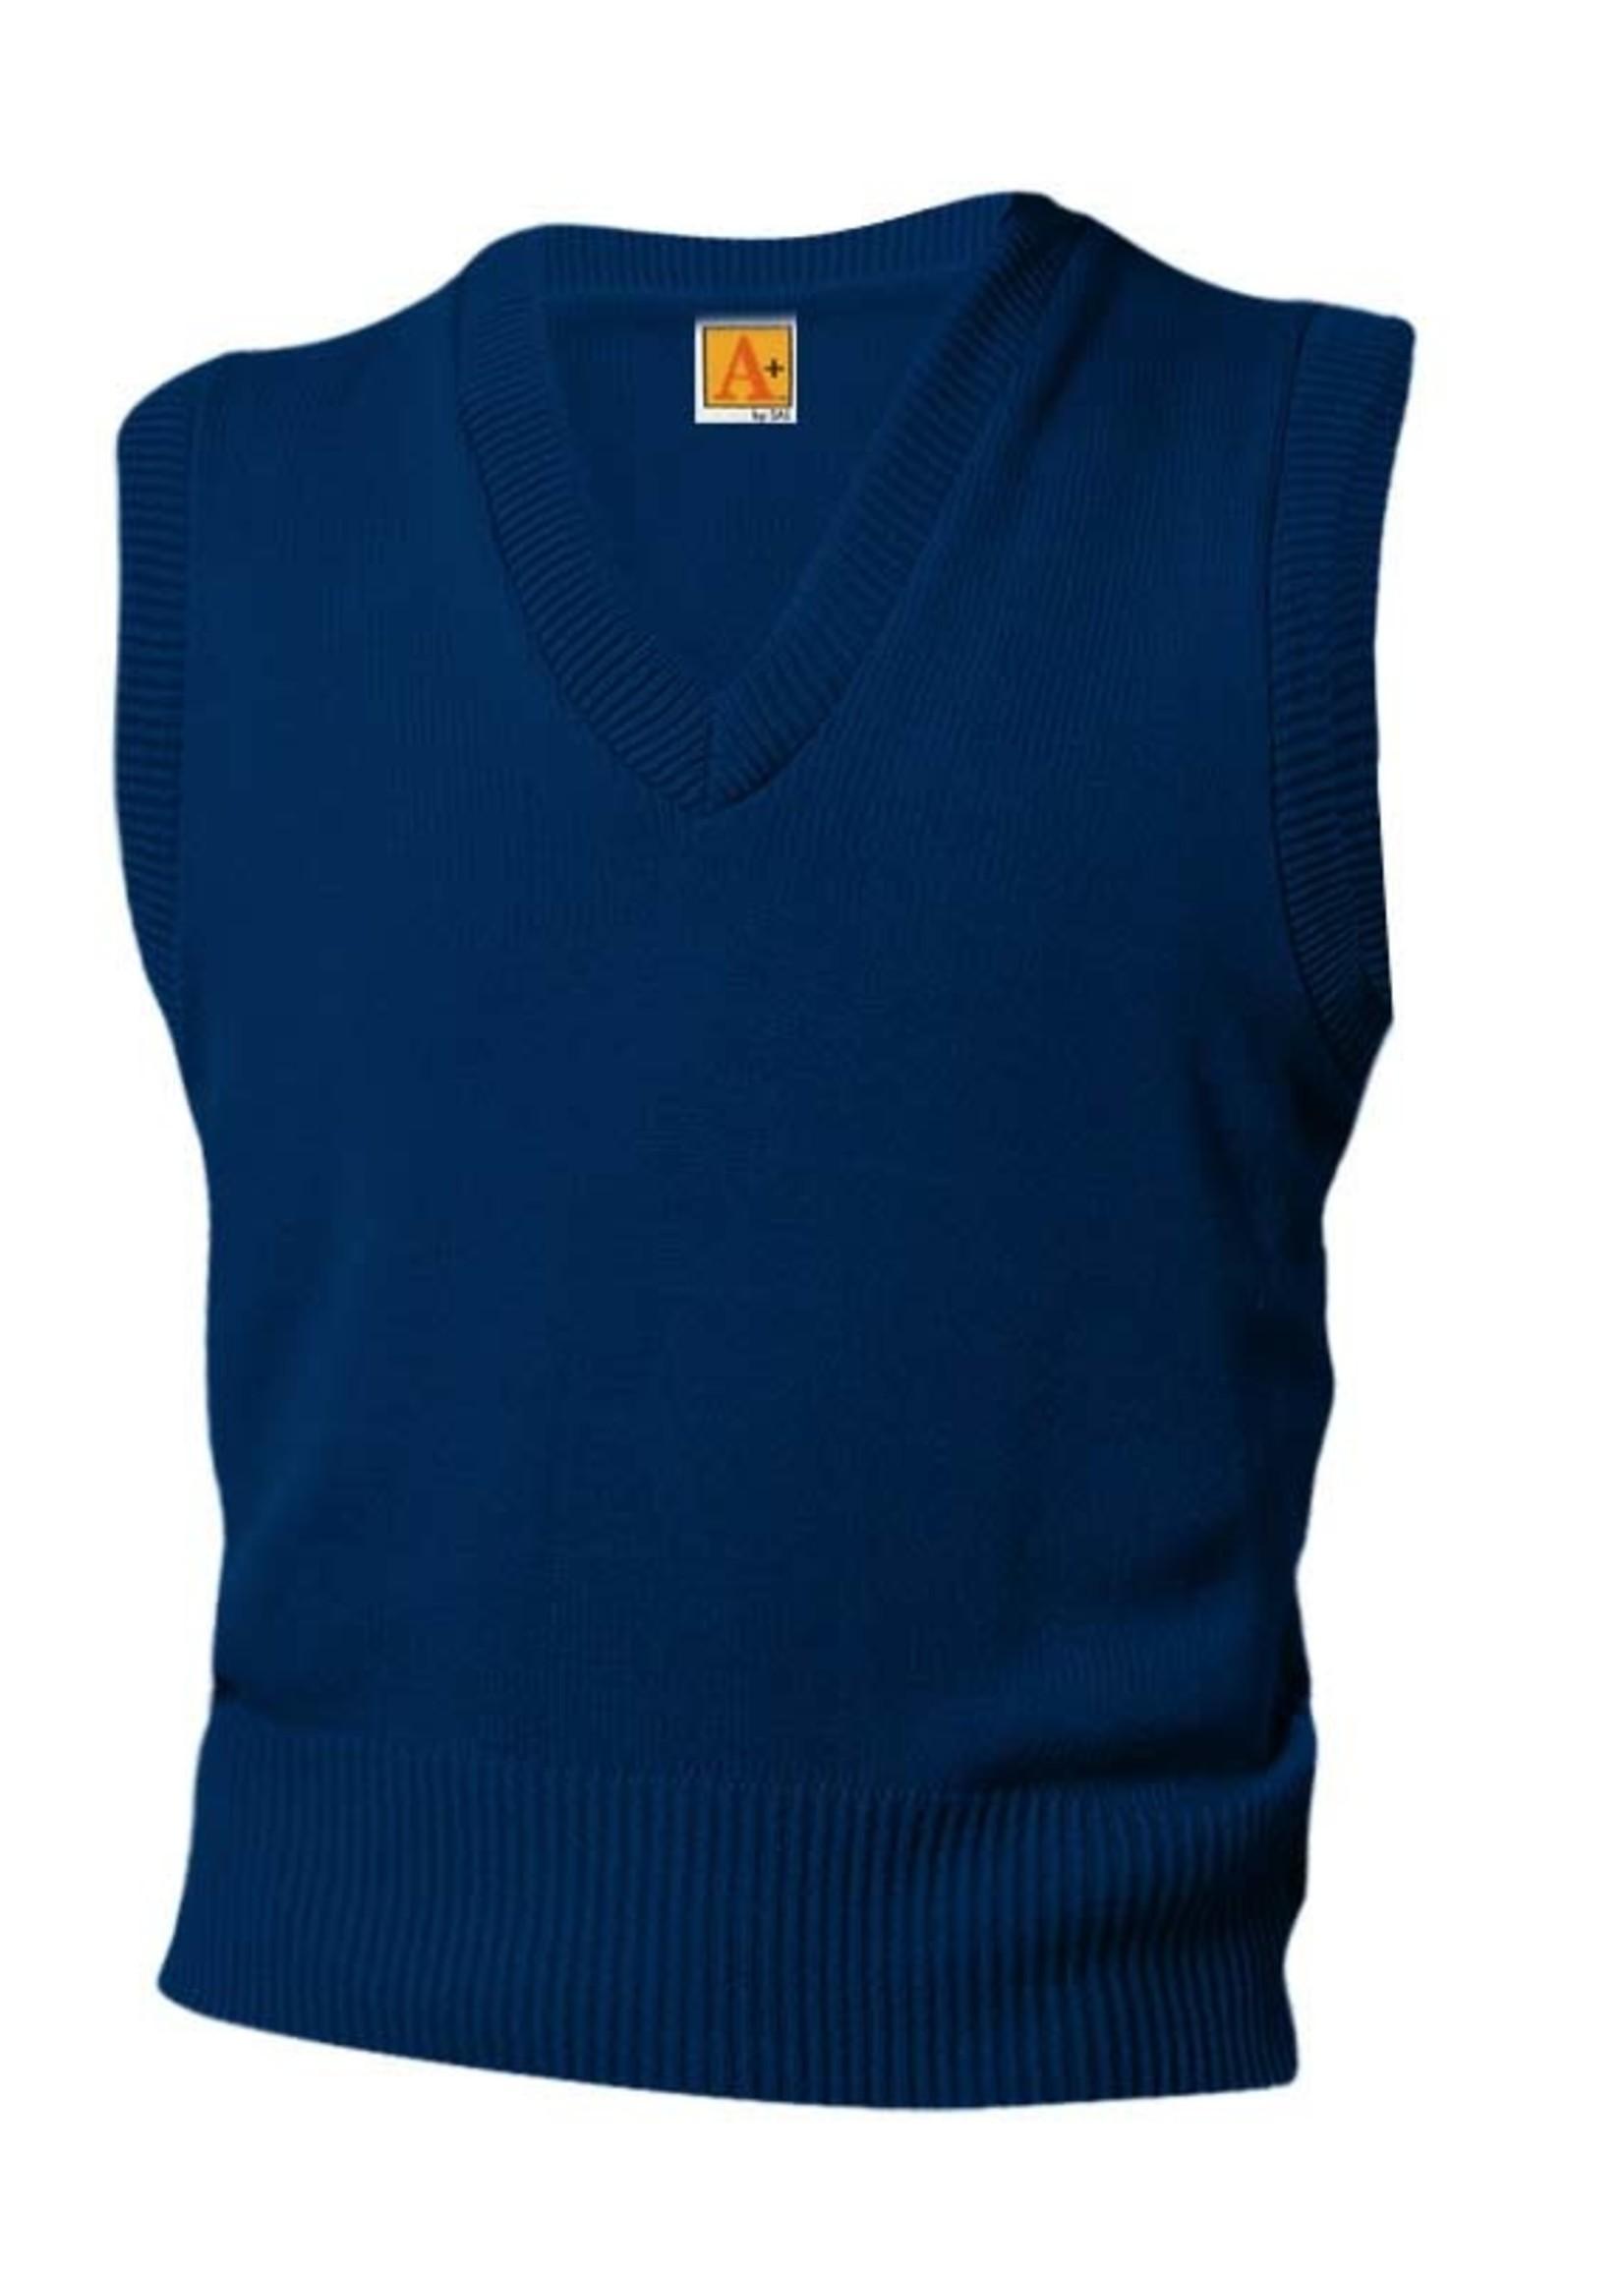 TUS FCLA Navy V-neck sweater vest